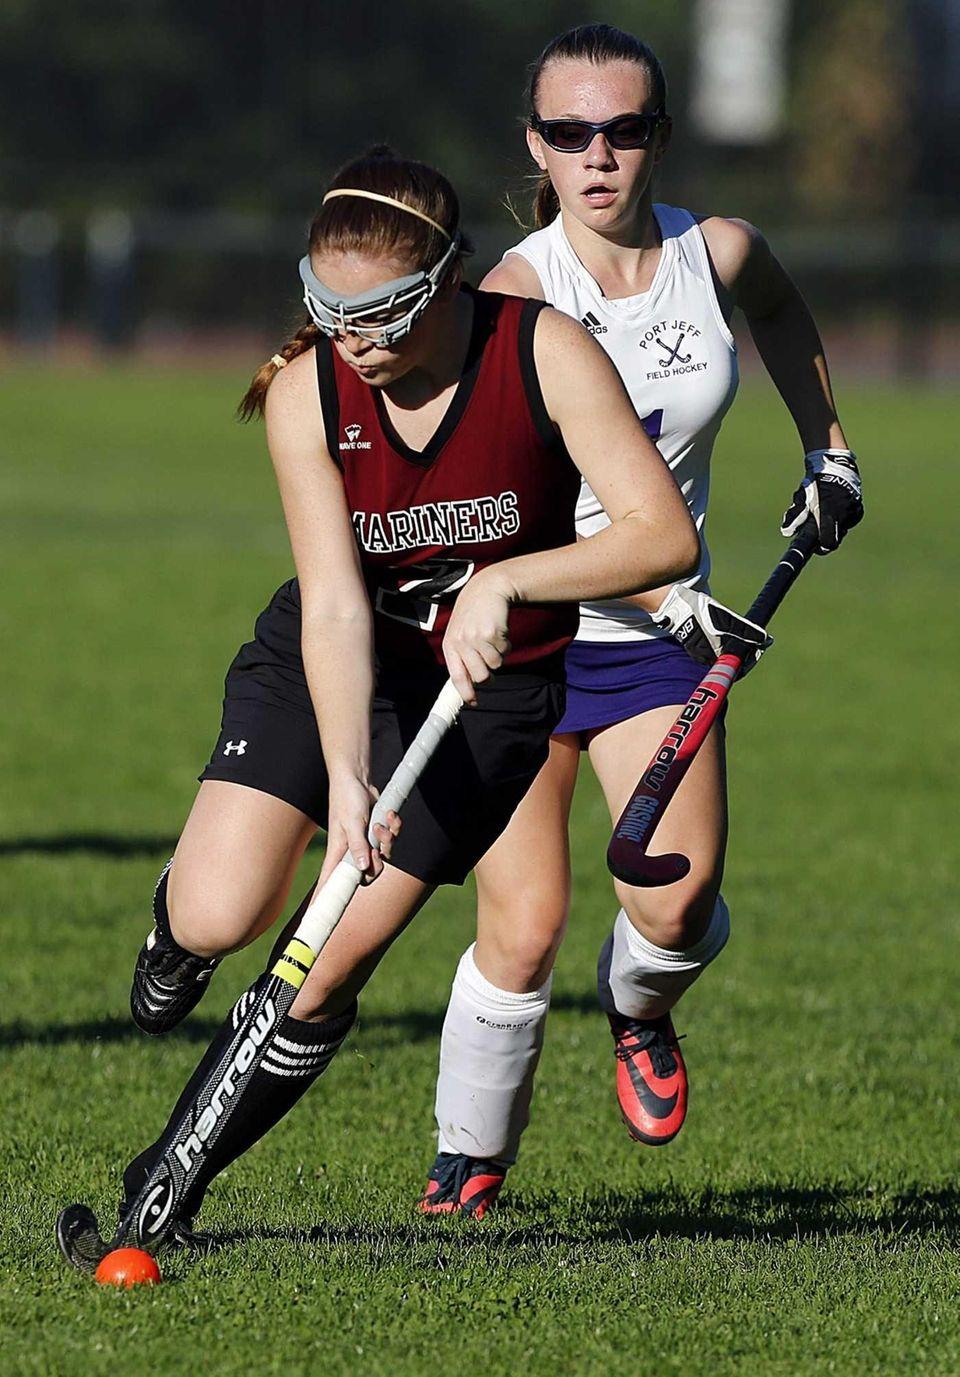 Southampton's Chloe Schmidt advances the ball ahead of